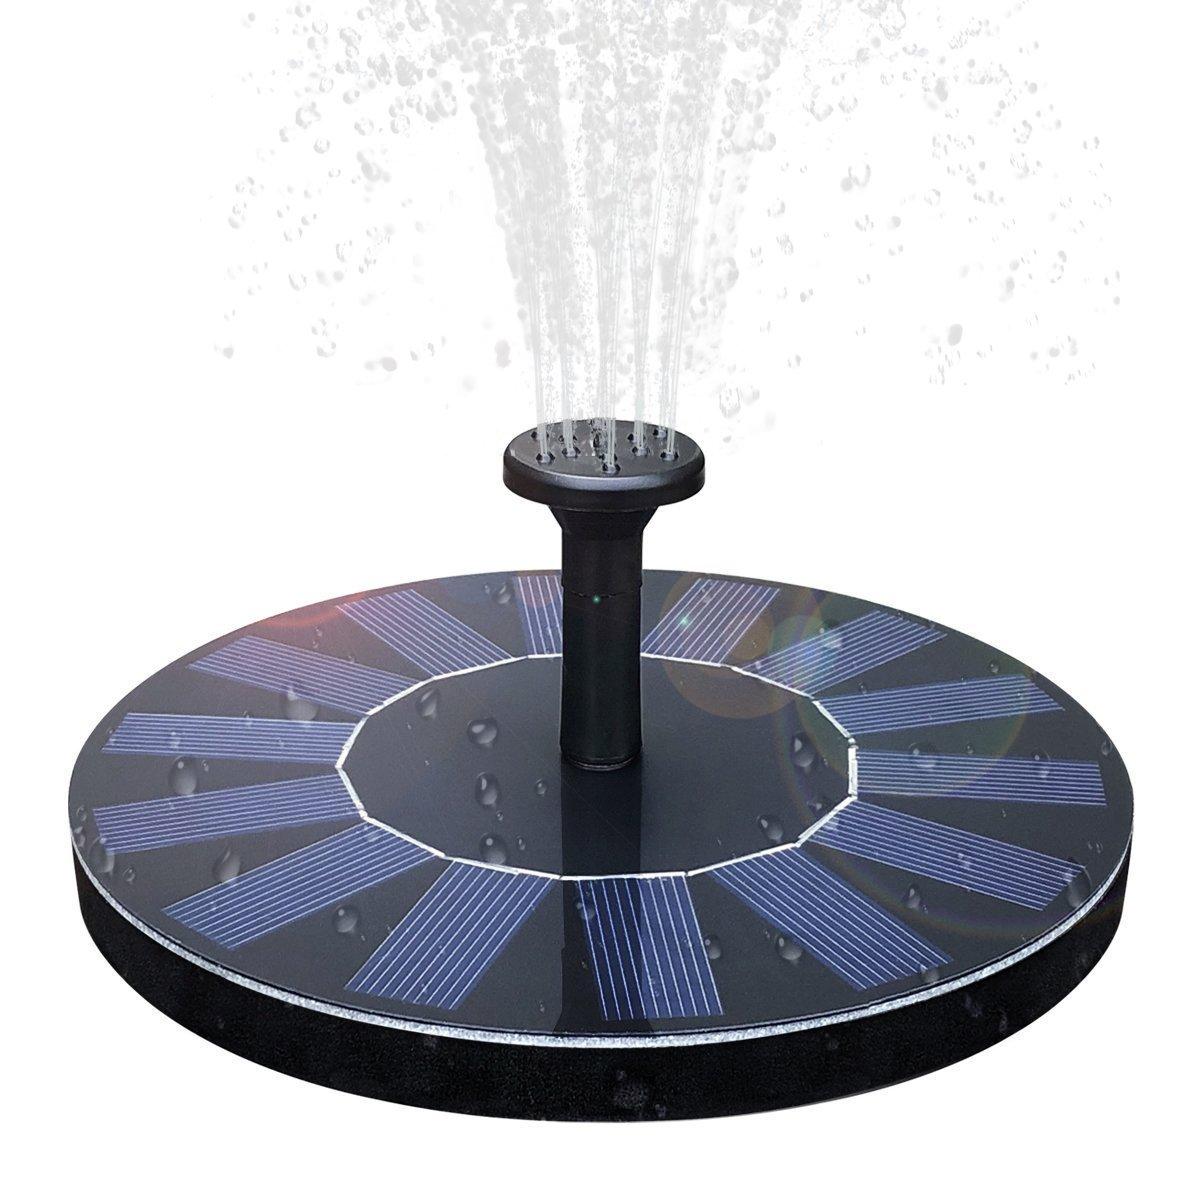 SENLUO Solar Fountain,Solar Powered Bird Bath Fountain Pump 1.4W Solar Panel Kit Water Pump,Outdoor Watering Submersible Pump for Fish Tank,Garden,Pool,Pond,Aquarium